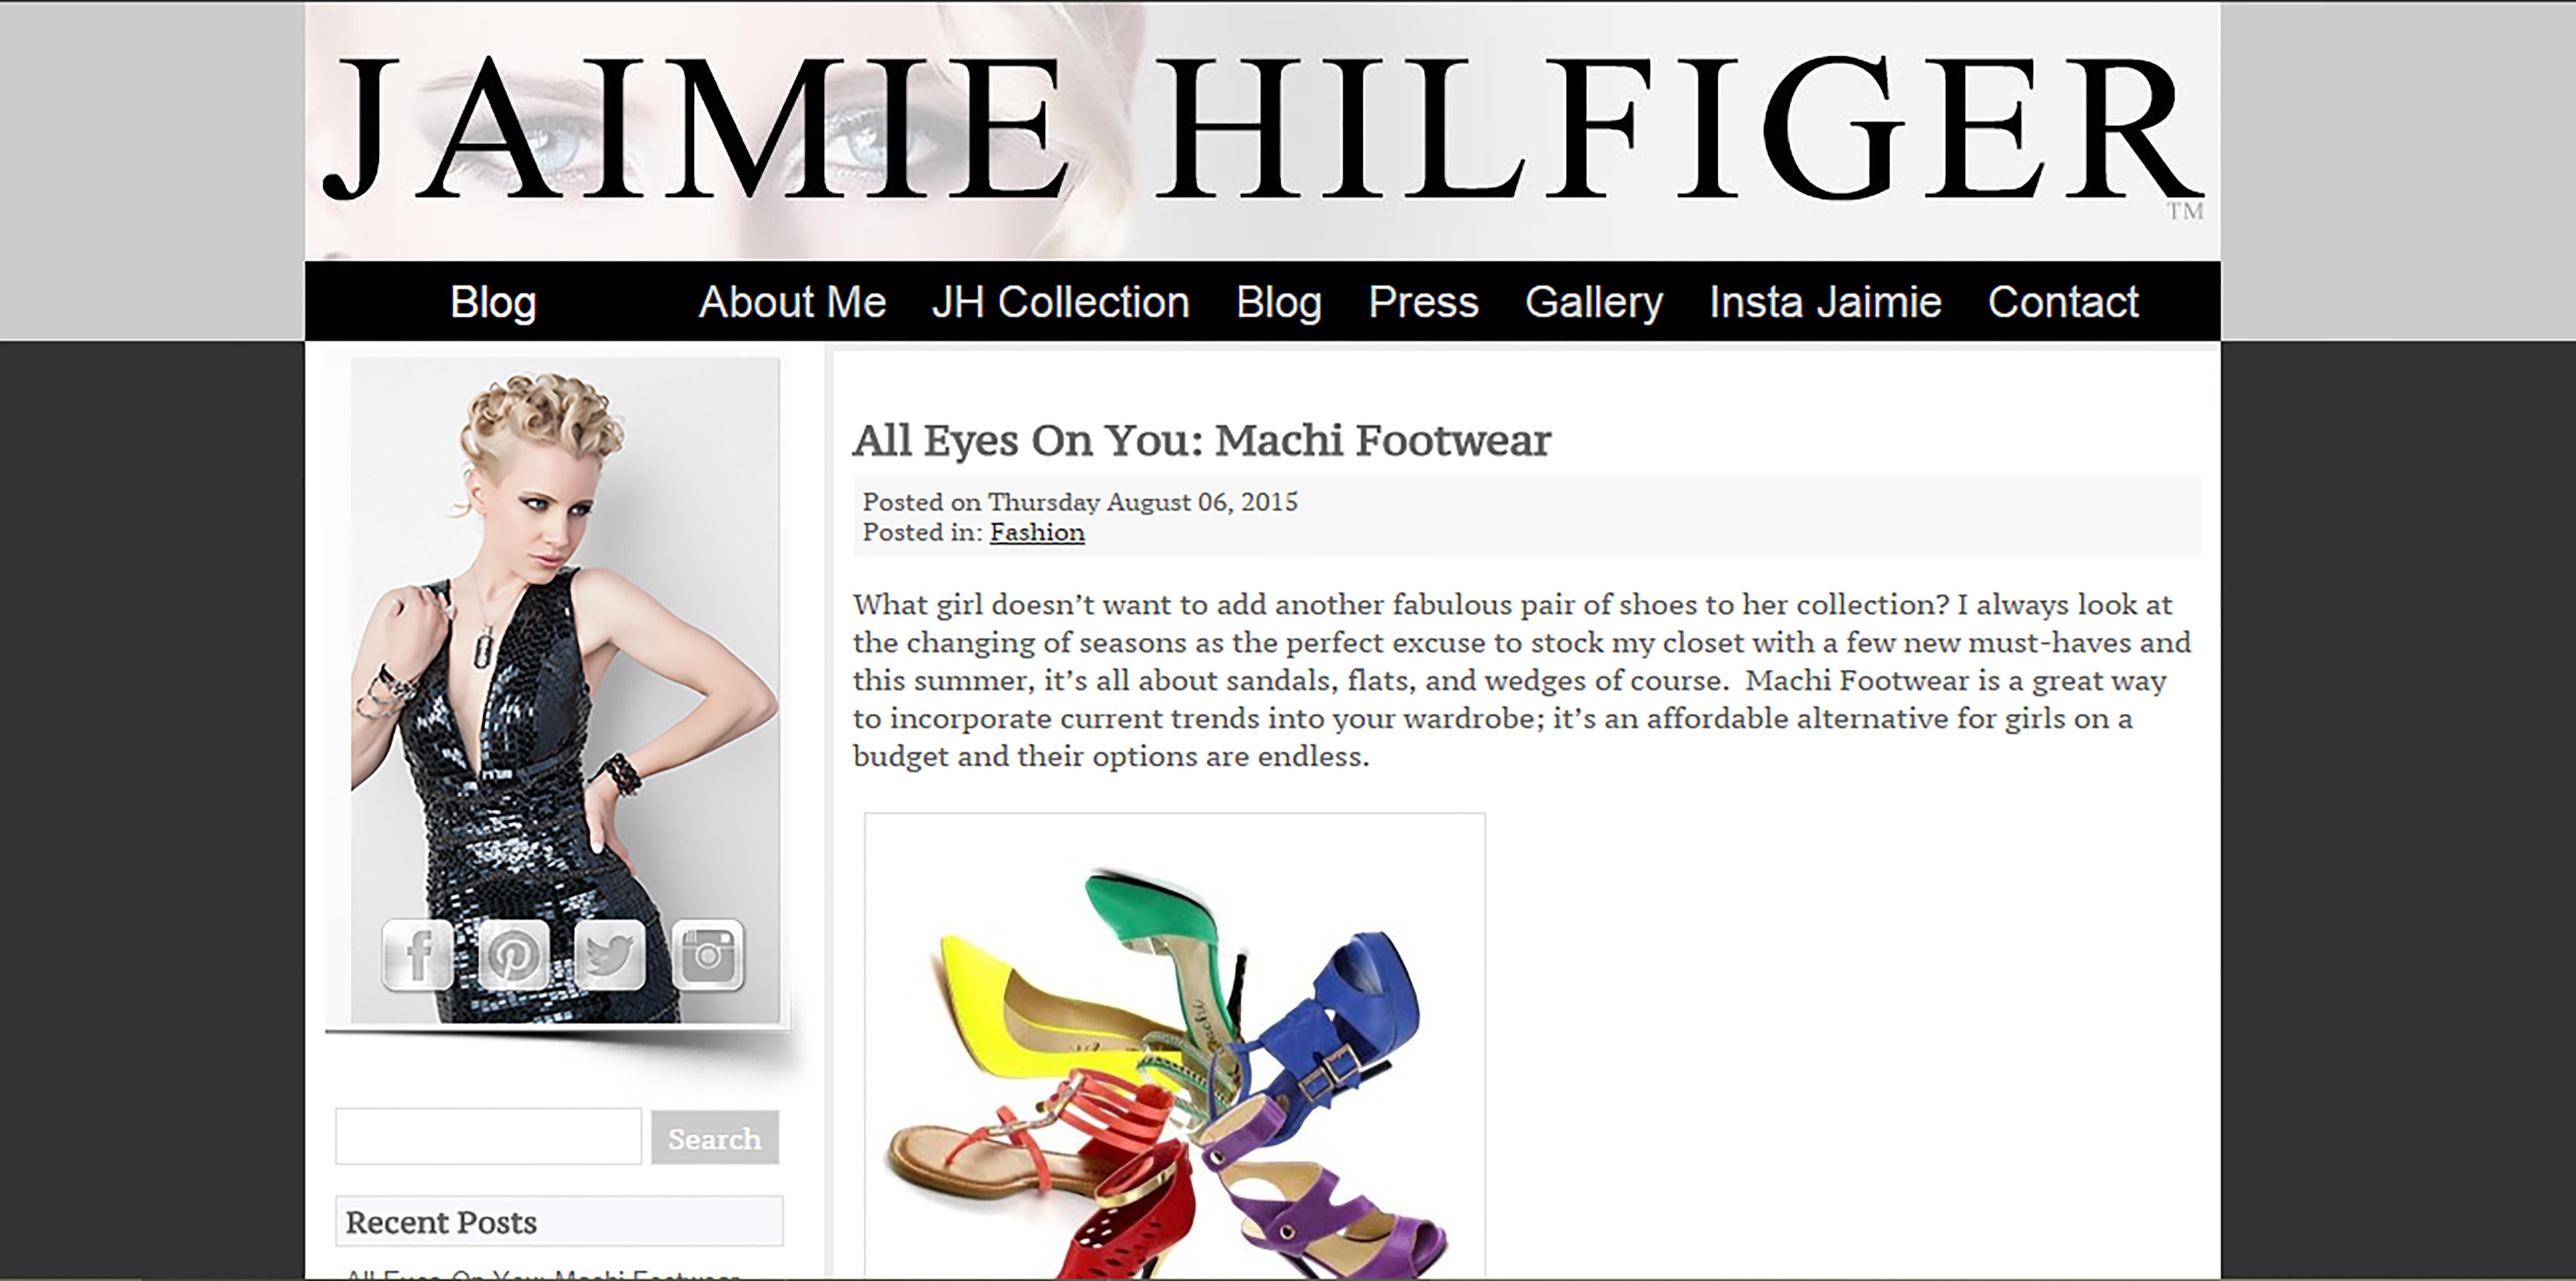 jaimie hilfiger screenshot